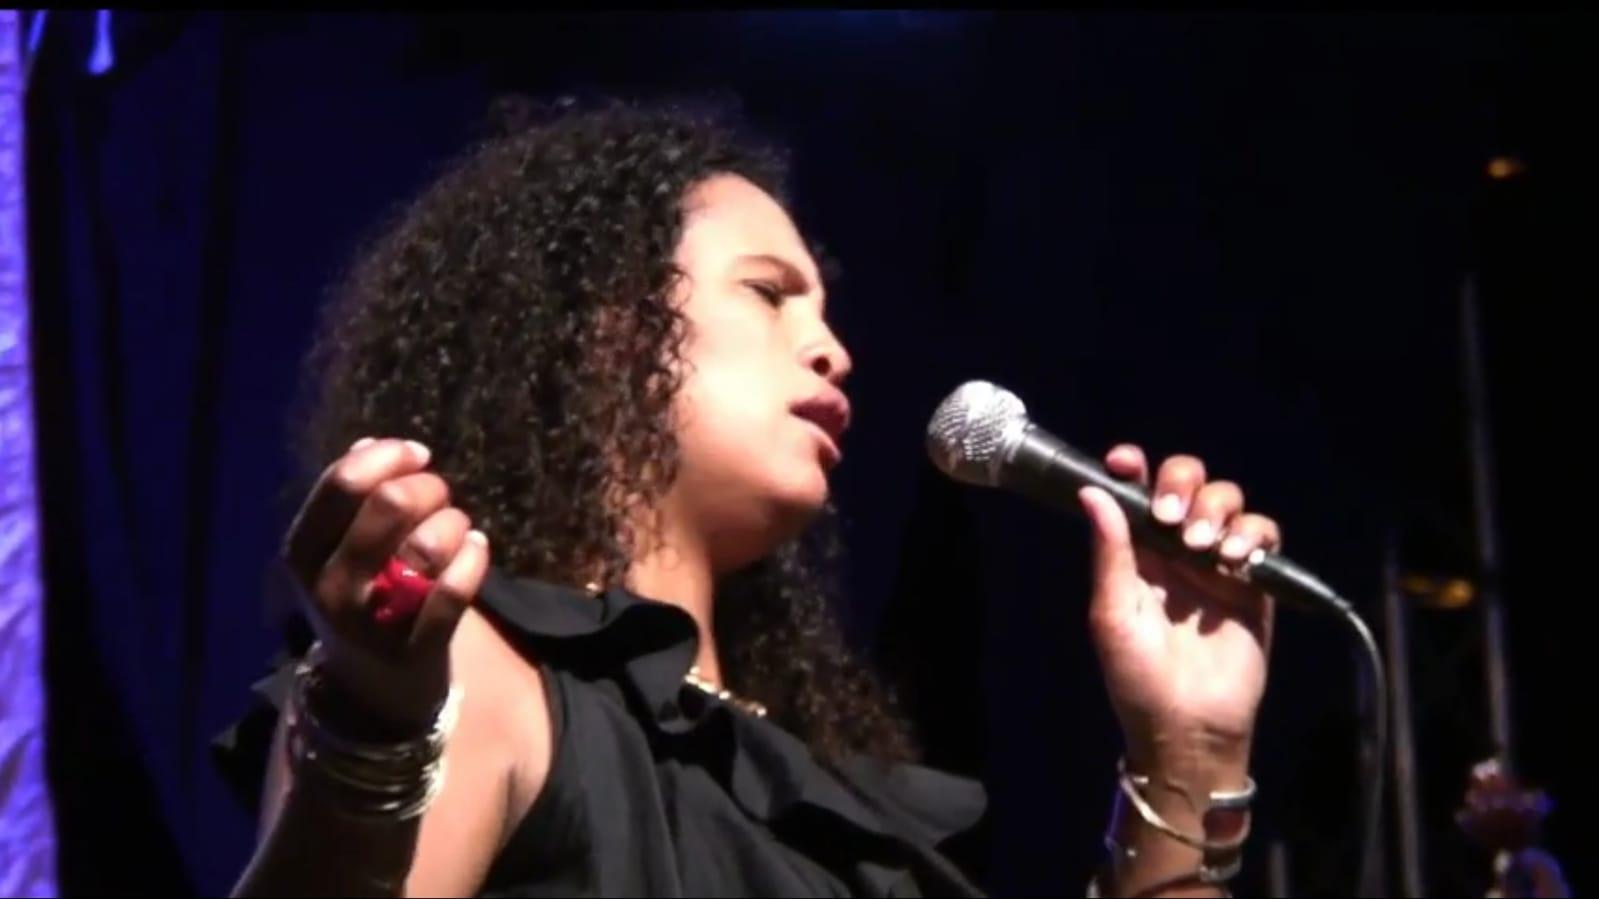 neneh cherry - cherryco - 2008 - sant'anna arresi - ai confini tra sardegna e jazz - xxiii edizione - sa scena sarda - 2019